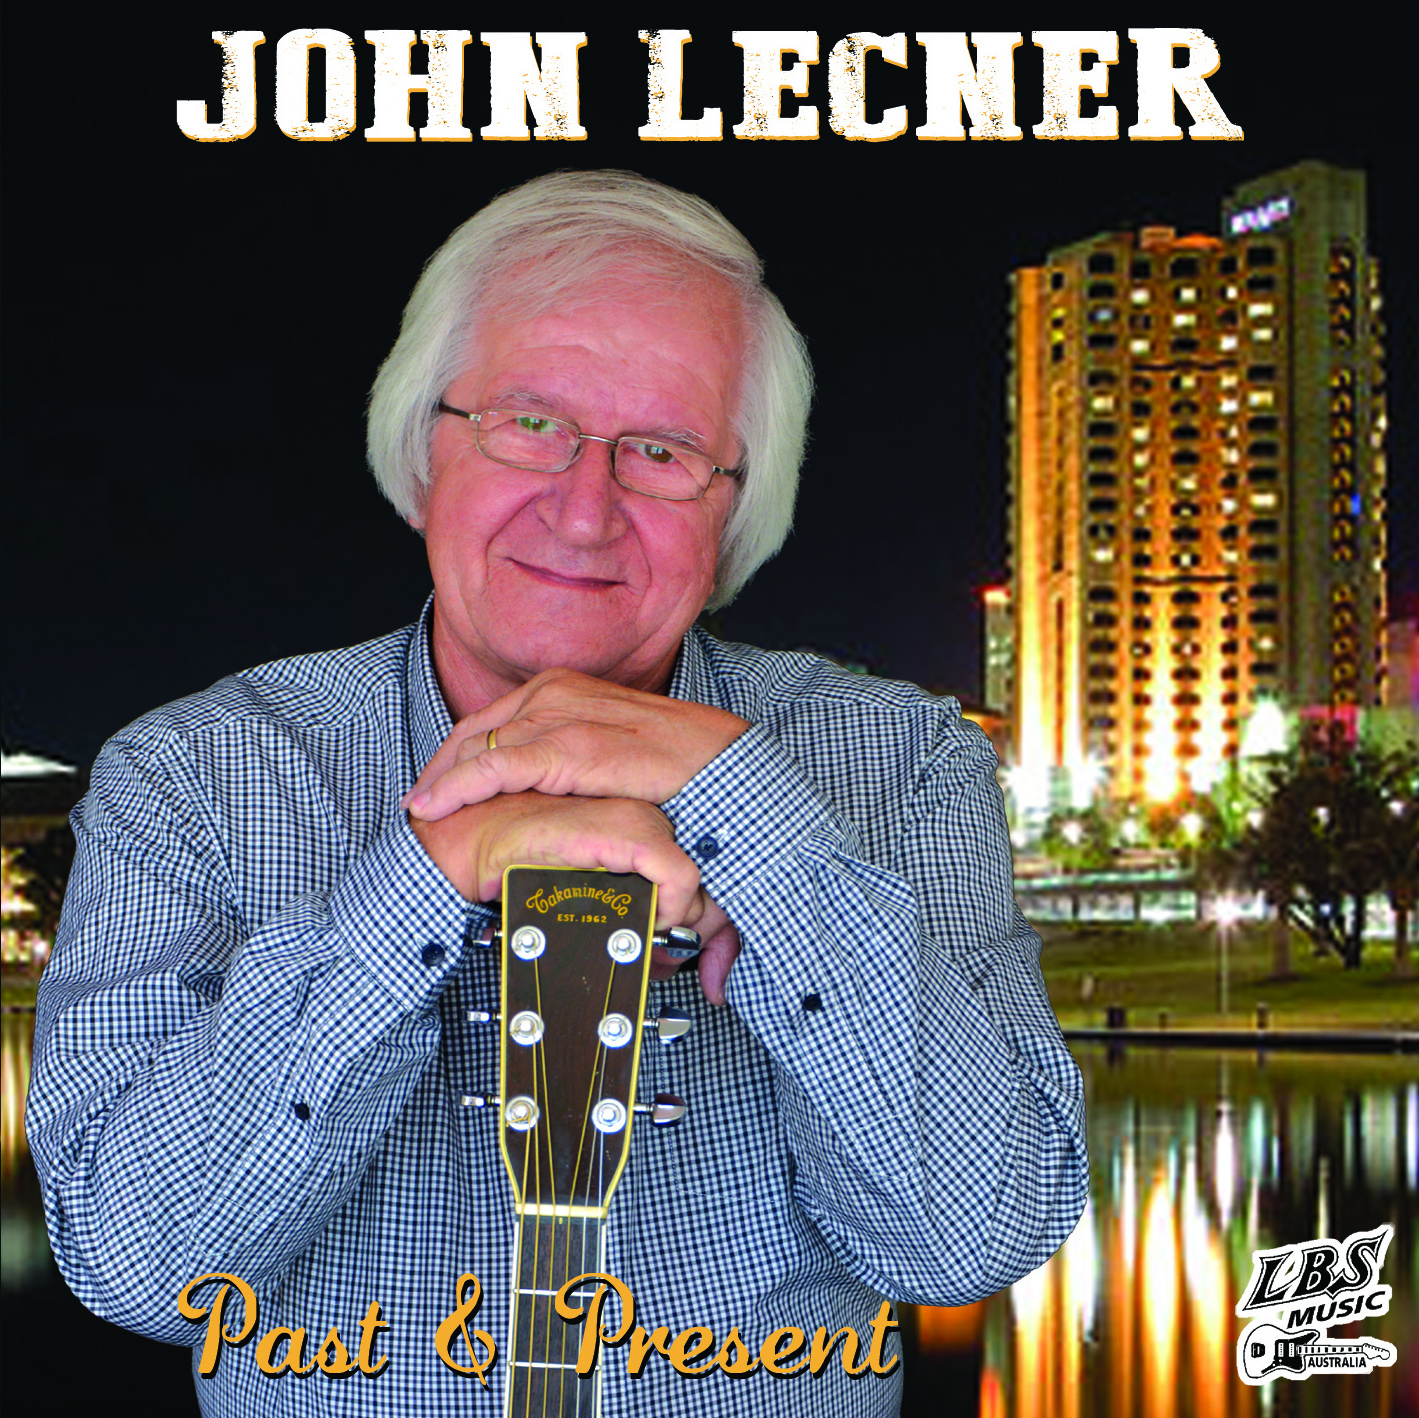 John Lecner Official Site